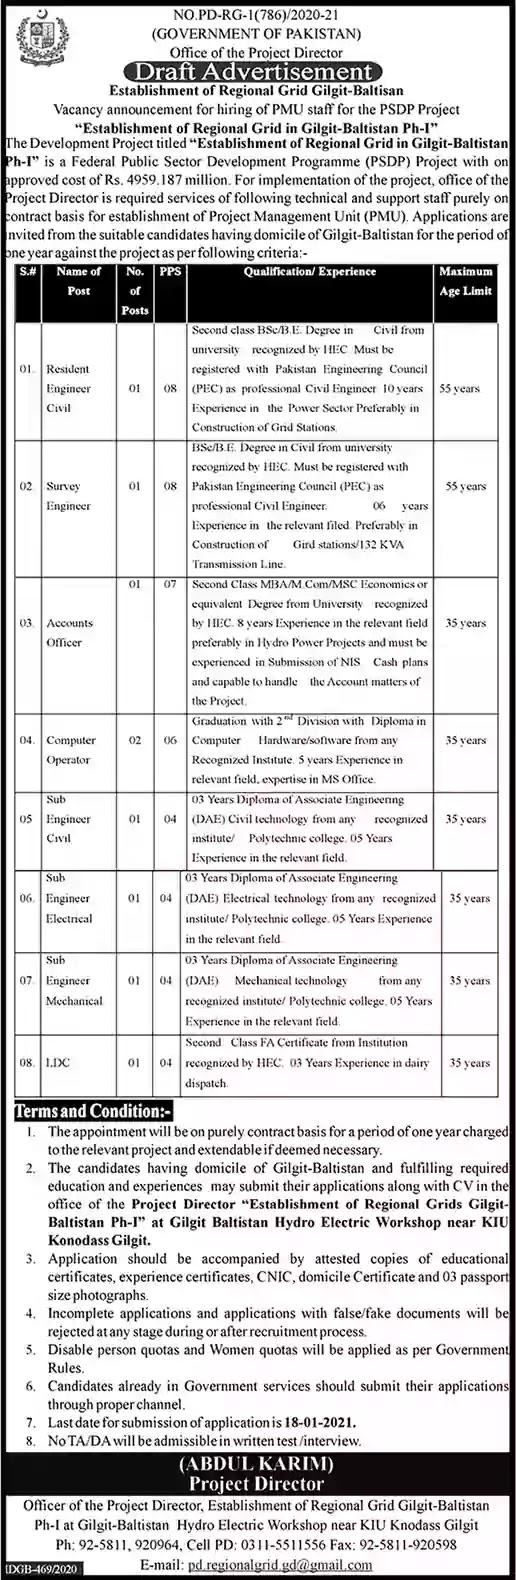 PSDP Gilgit Baltistan Jobs 2021 Regional Grid PMU Sub Engineers & Others Latest